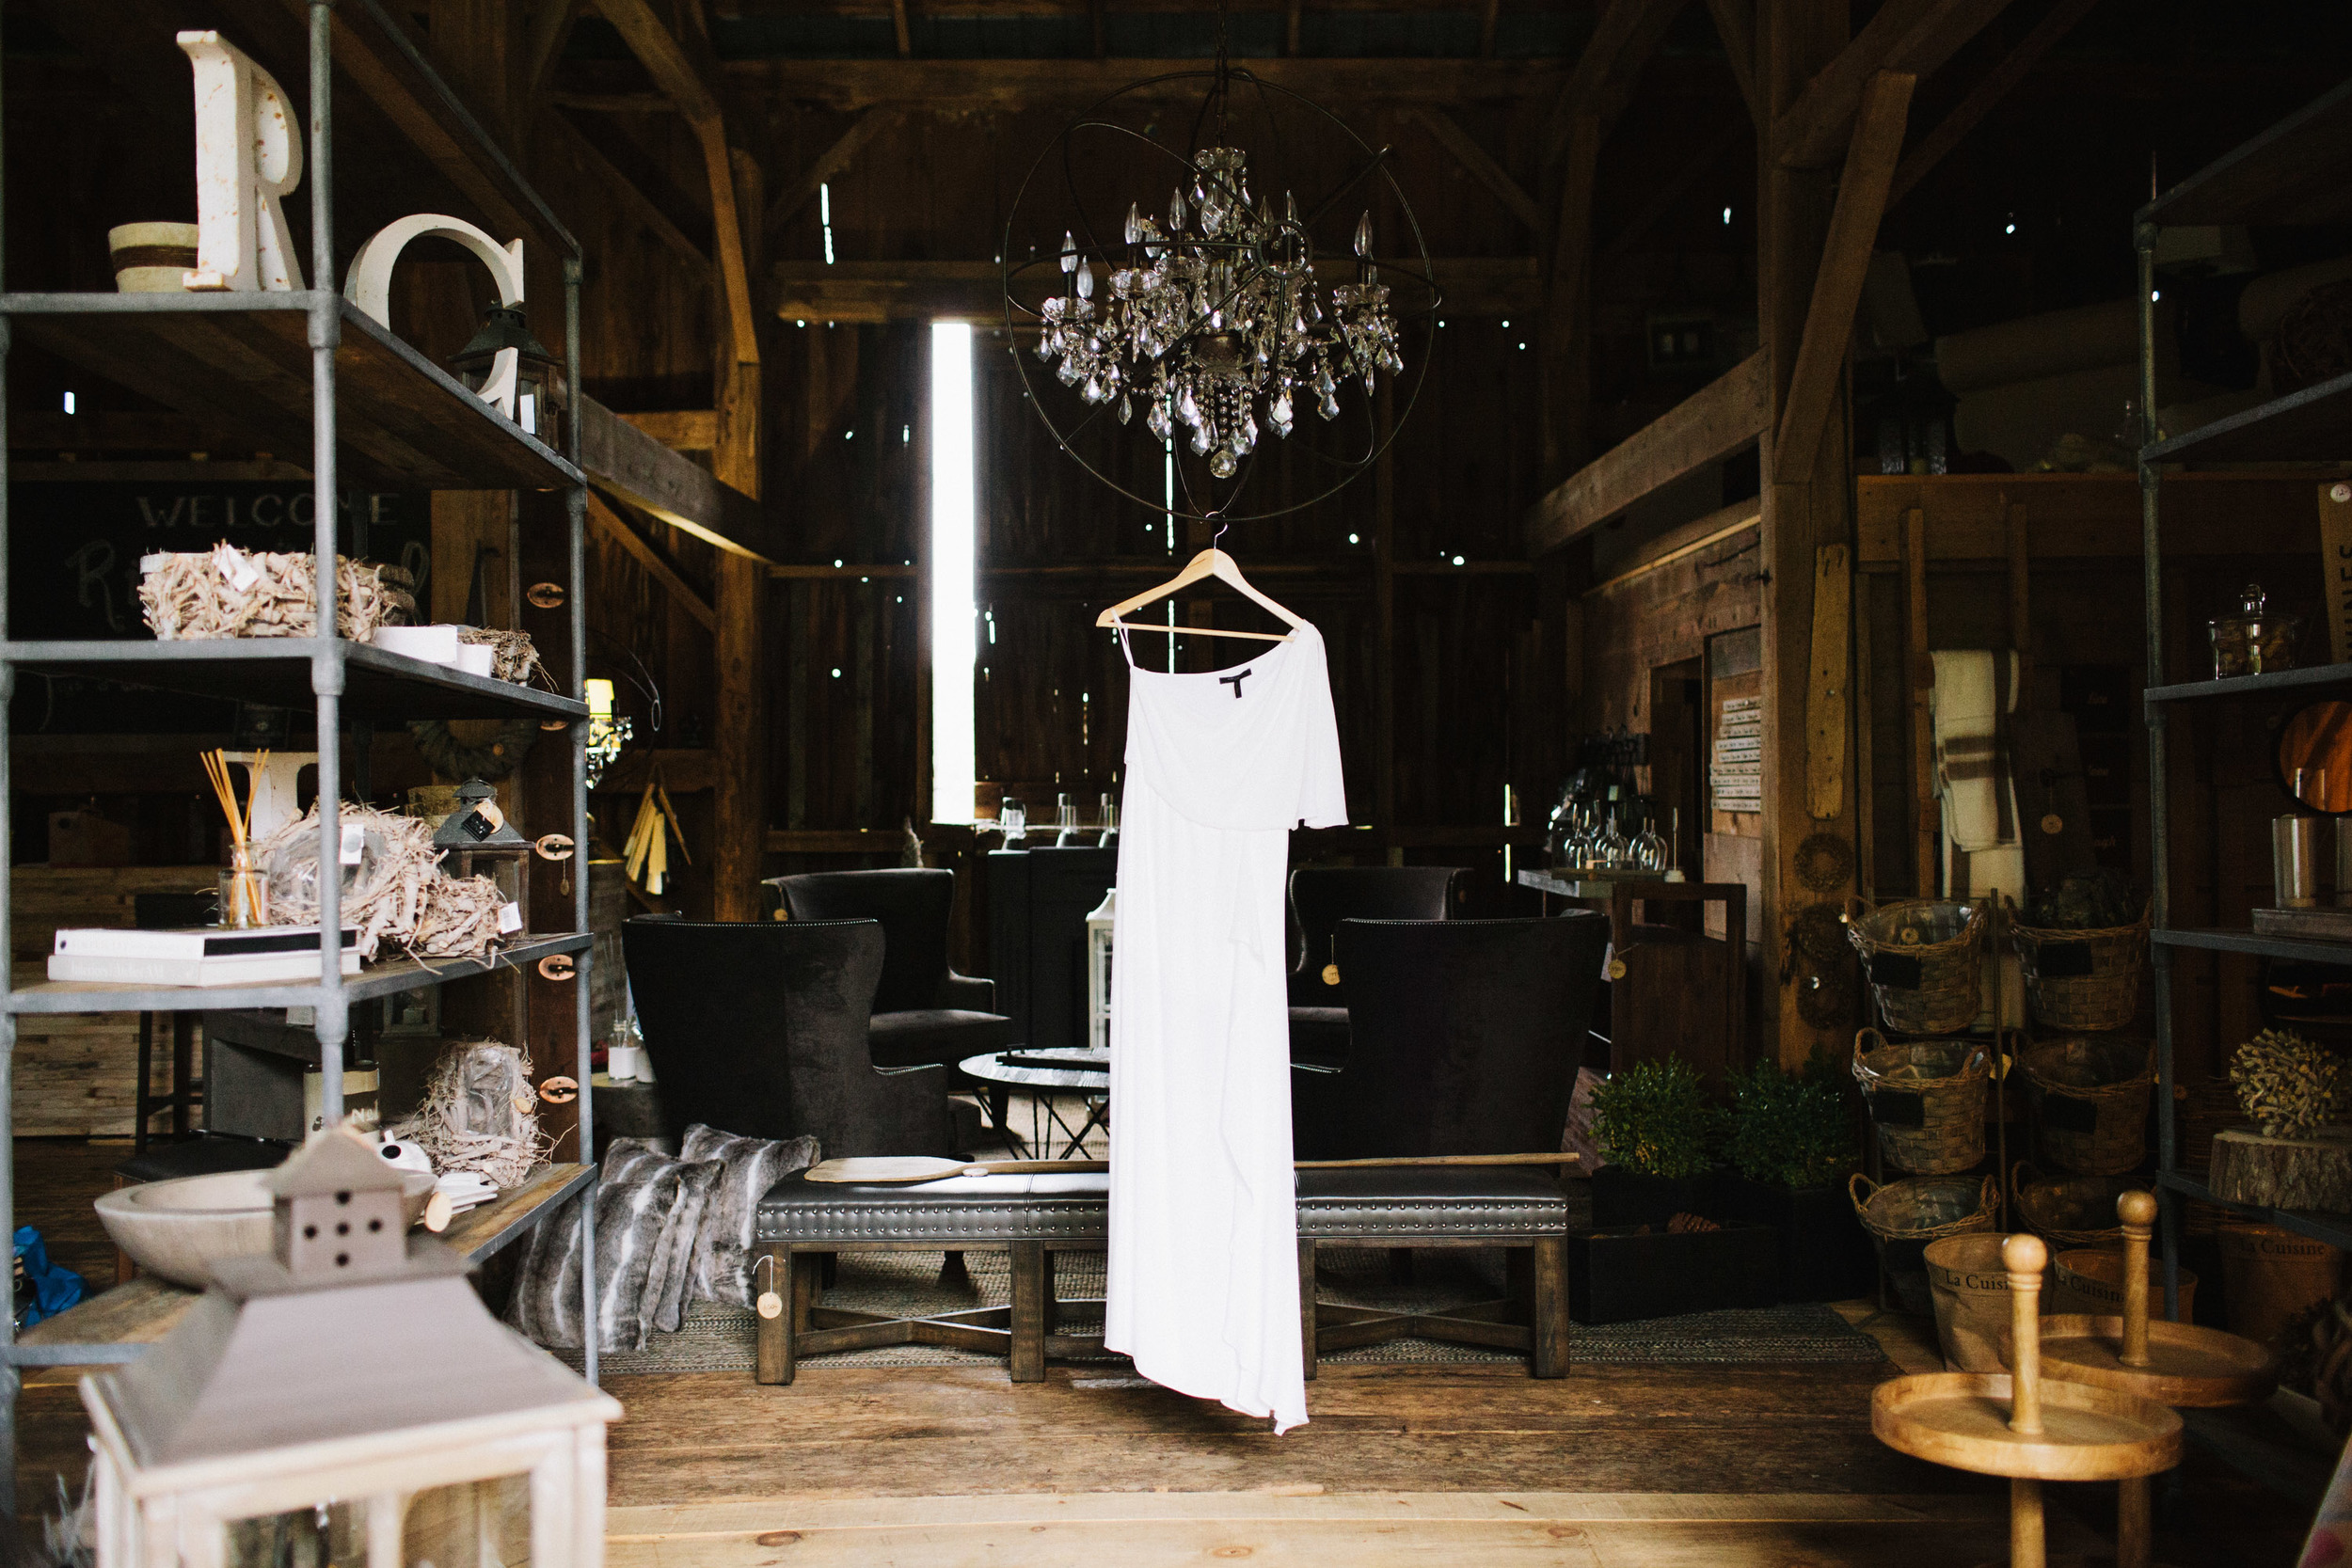 rivercroft-interiors-michael-rousseau-photography014.jpg